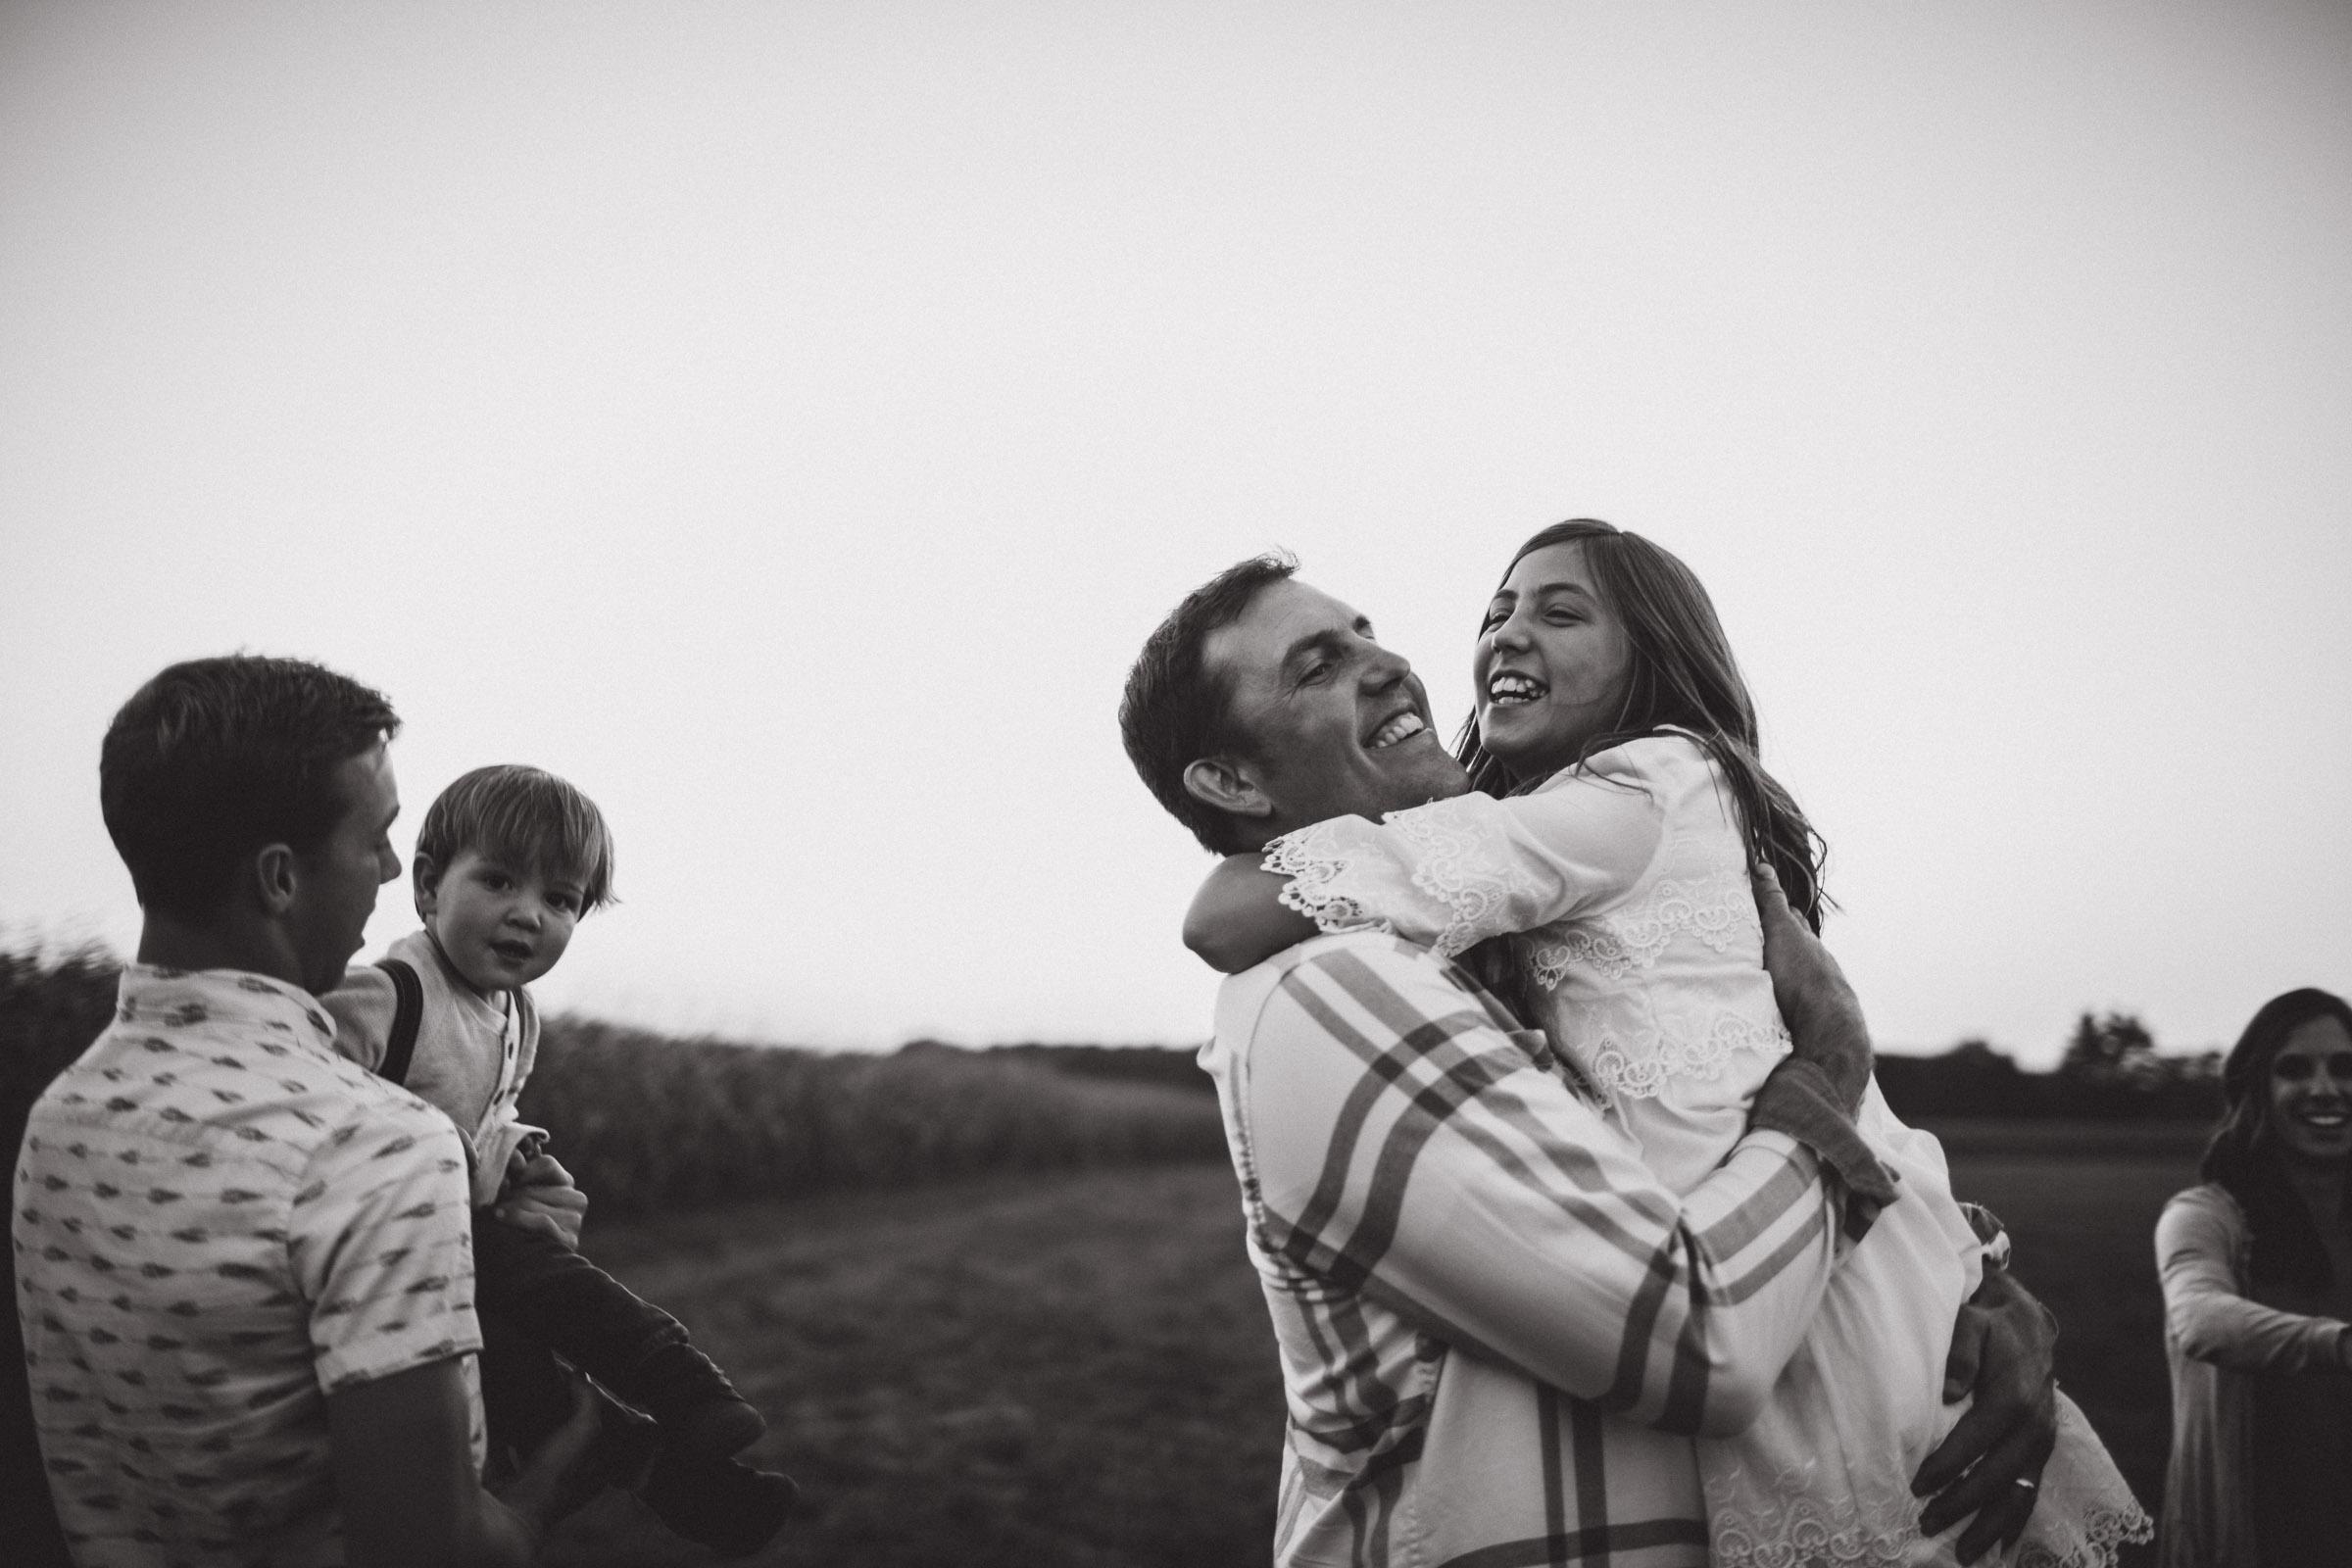 hugs of joy during dancing